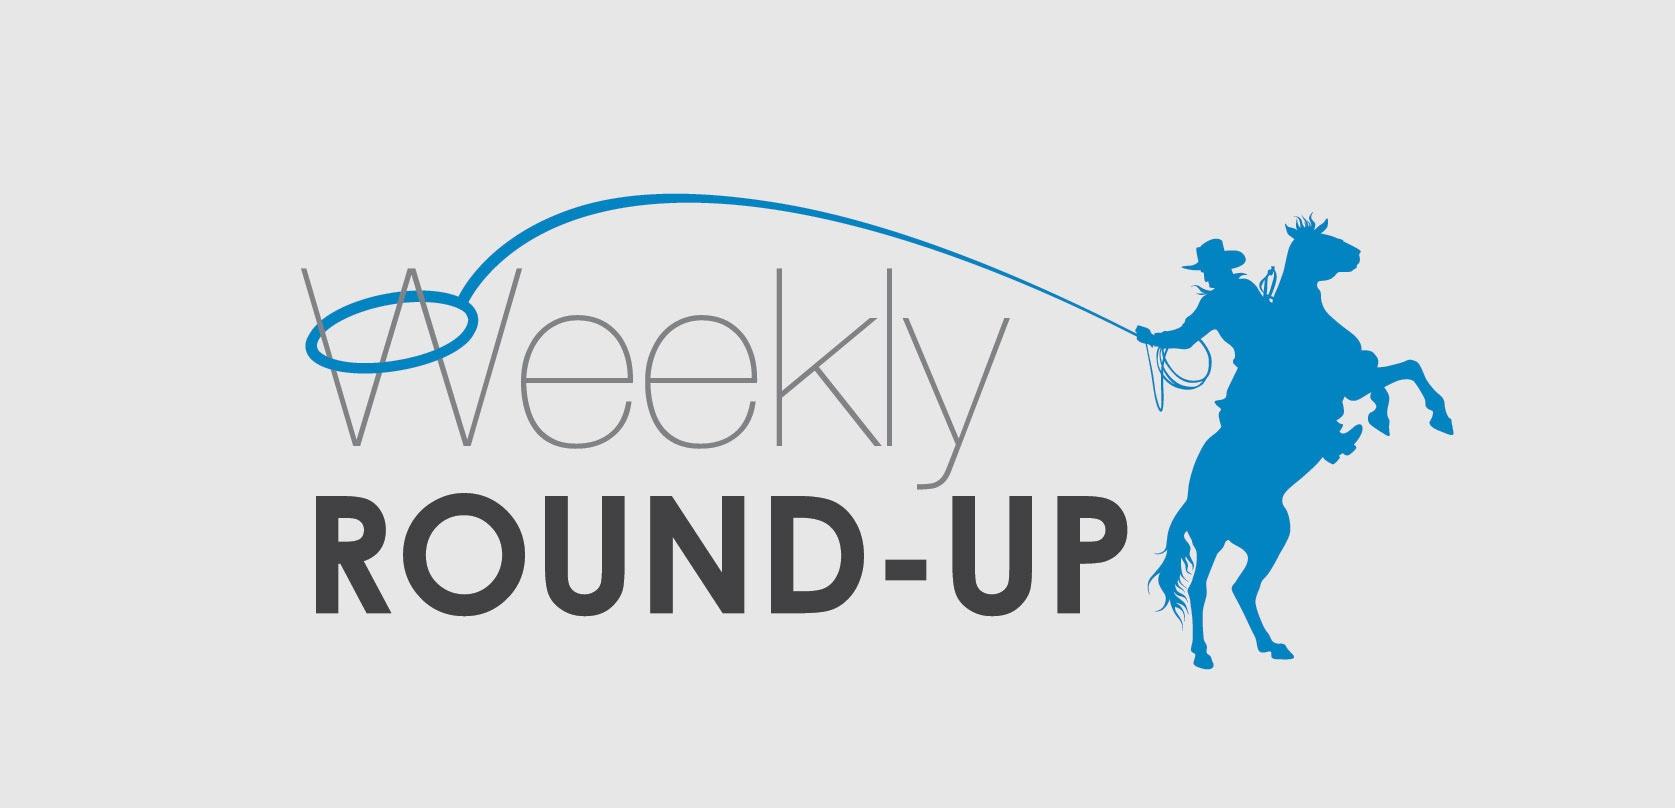 Weekly_Round_Up_V.1.jpg